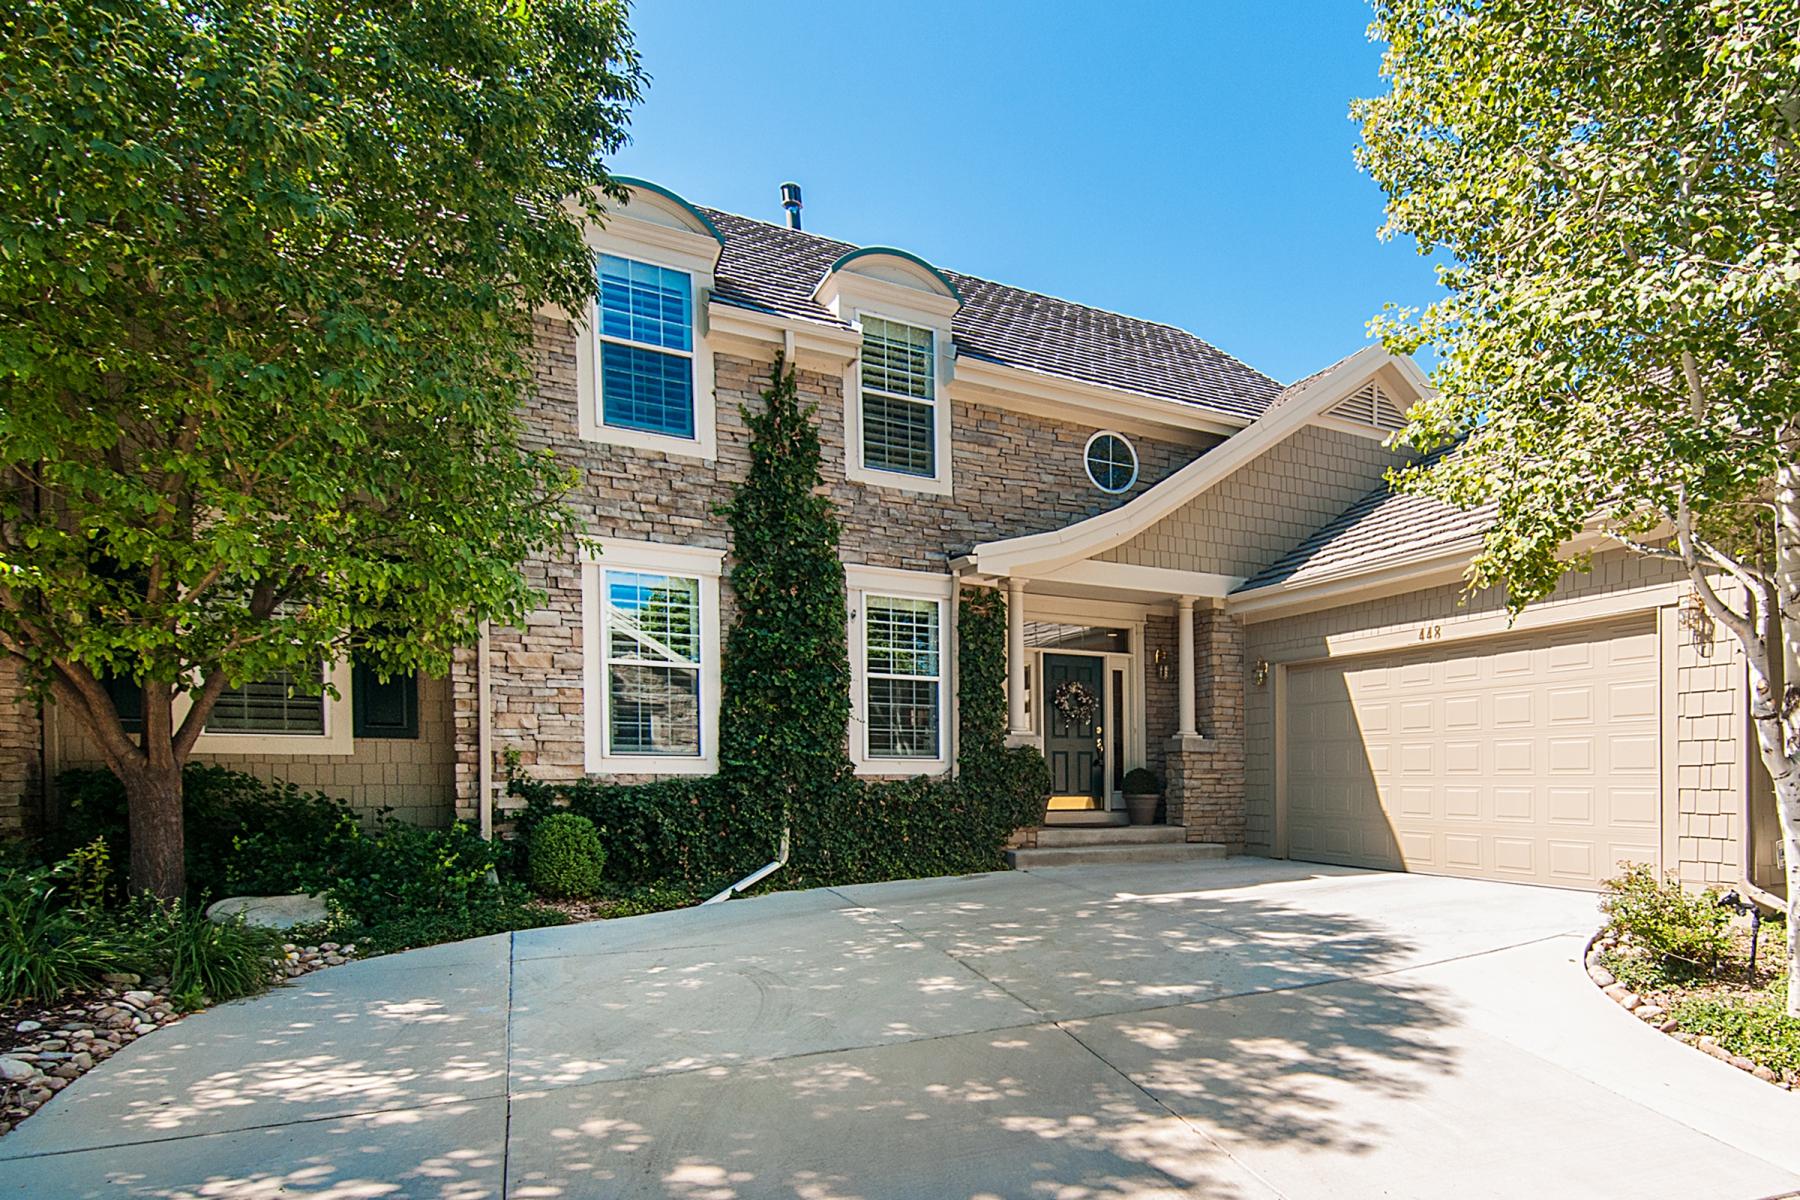 Single Family Home for Sale at Villas at Cherry Hills 4545 S Monaco Street Unit 448 Denver, Colorado 80237 United States